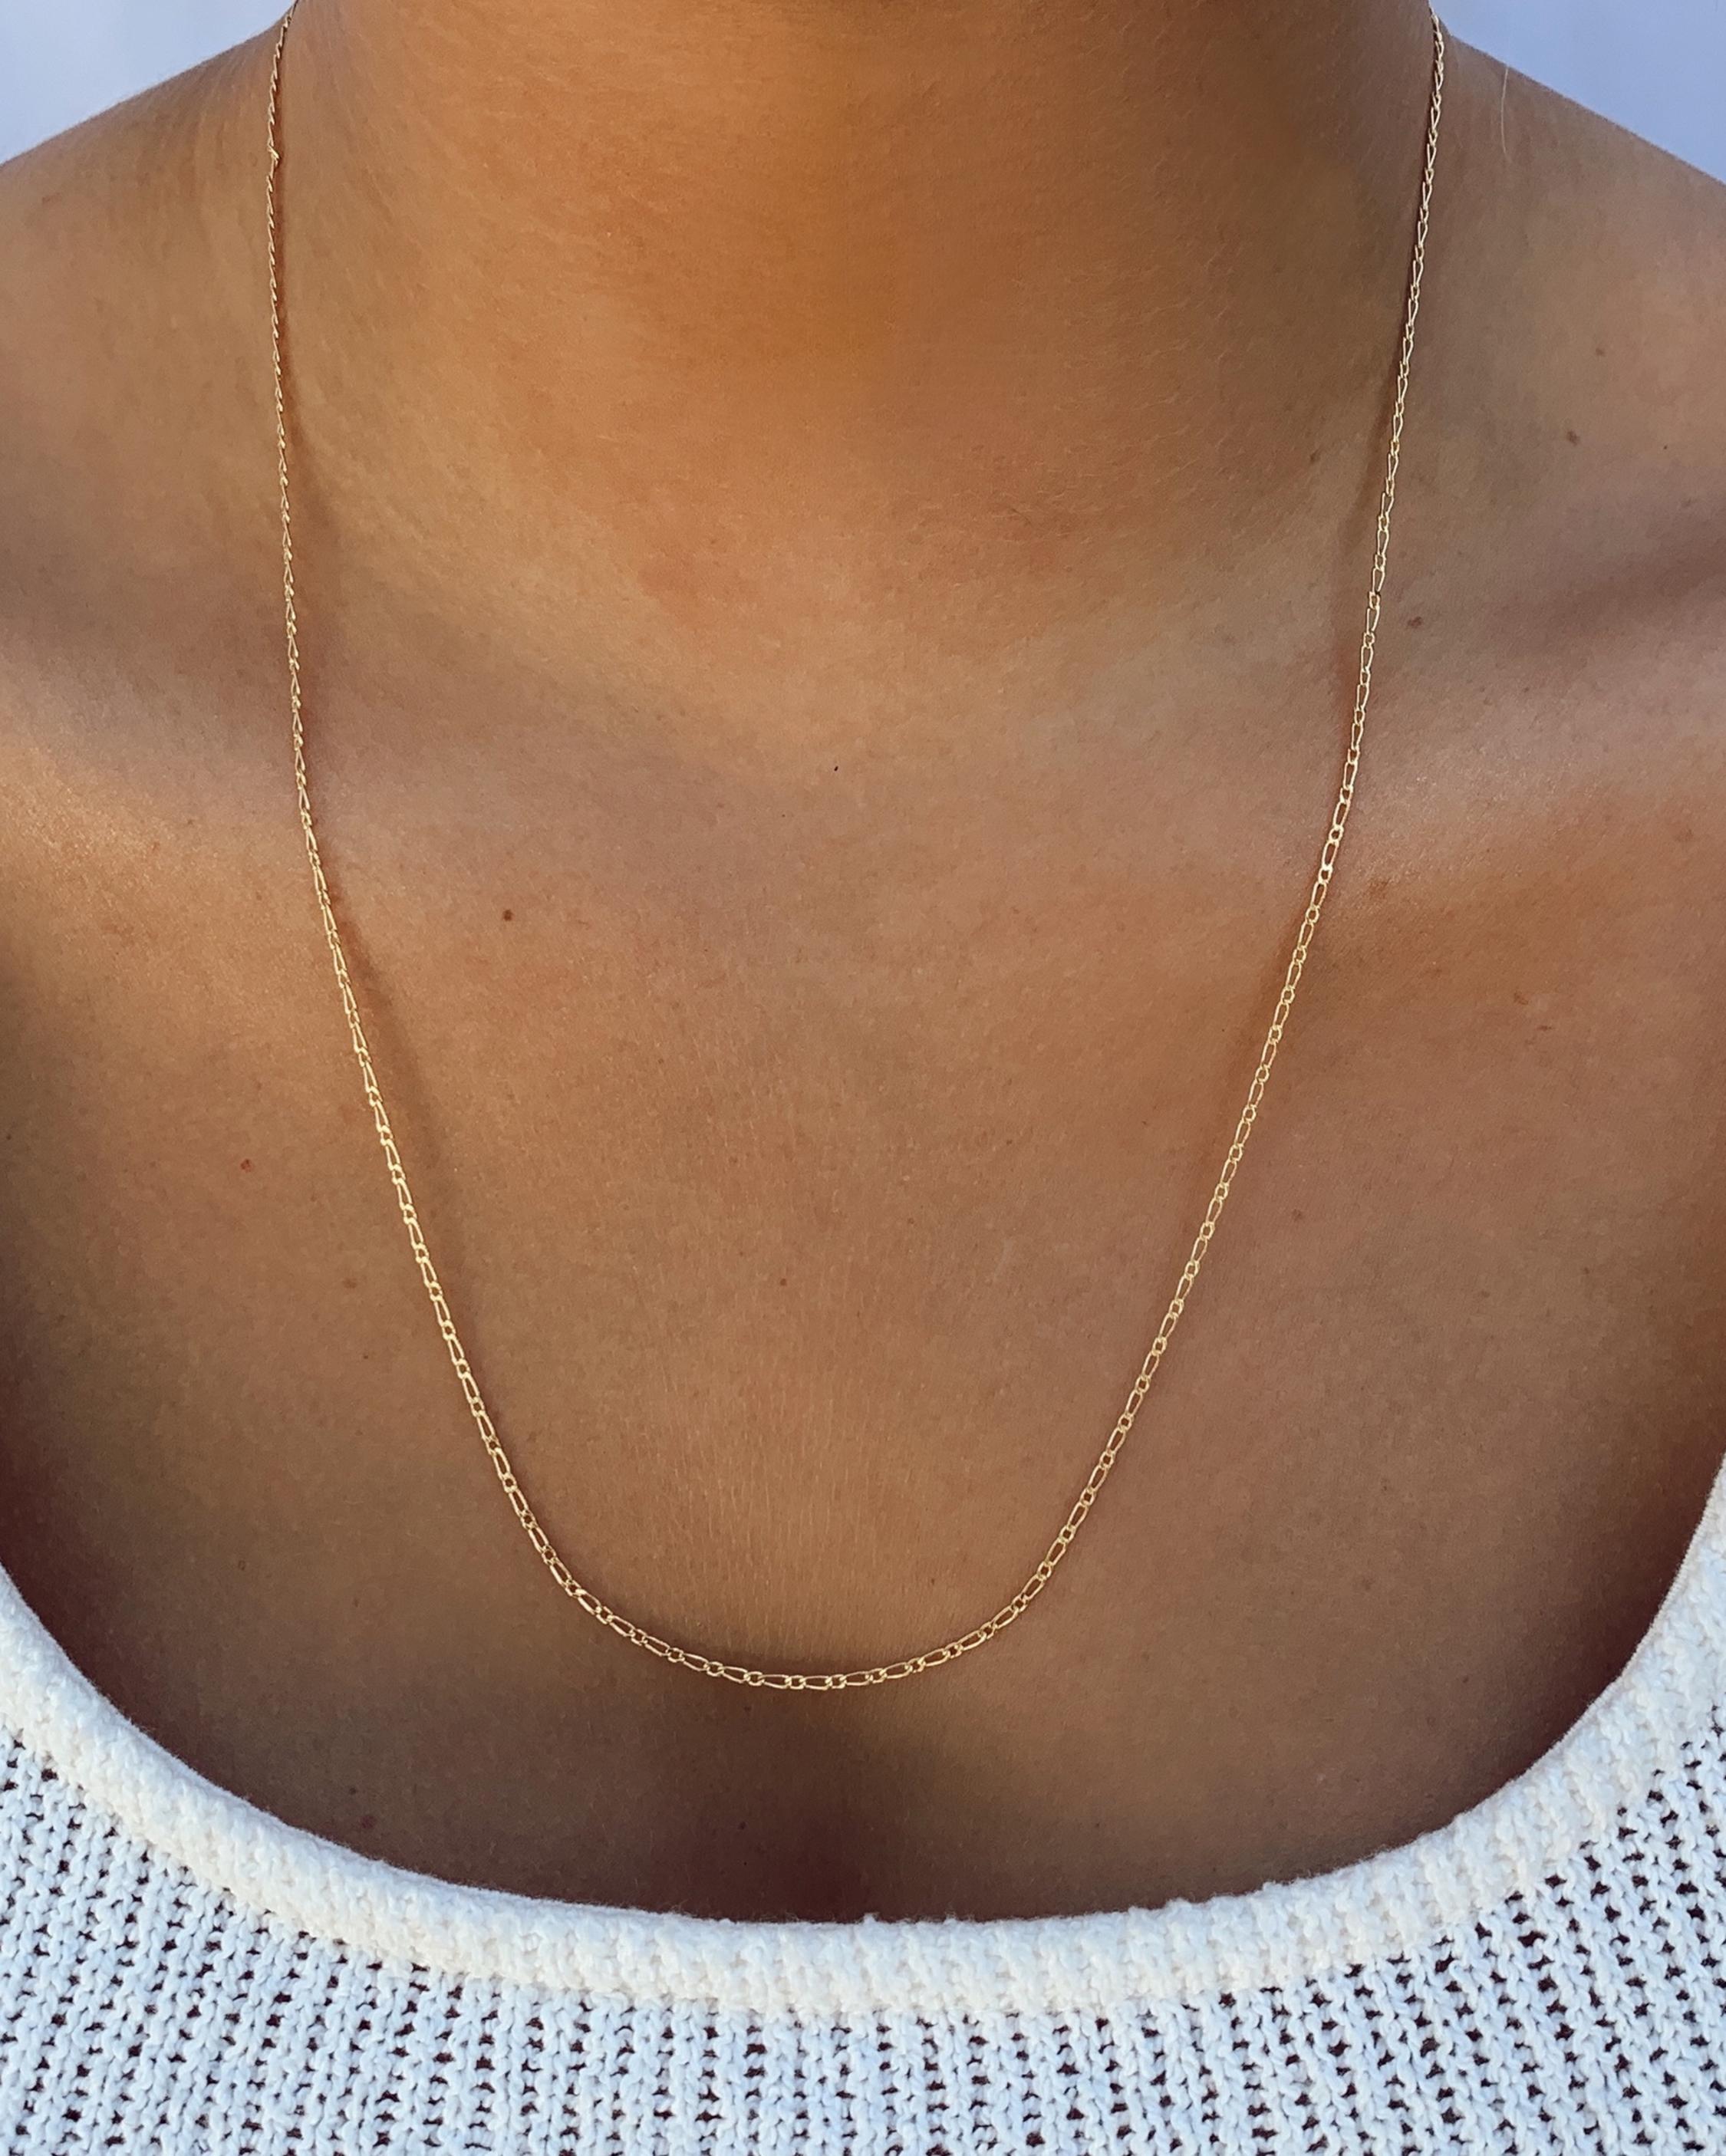 Jordan Road Jewelry Positano Chain Necklace 2